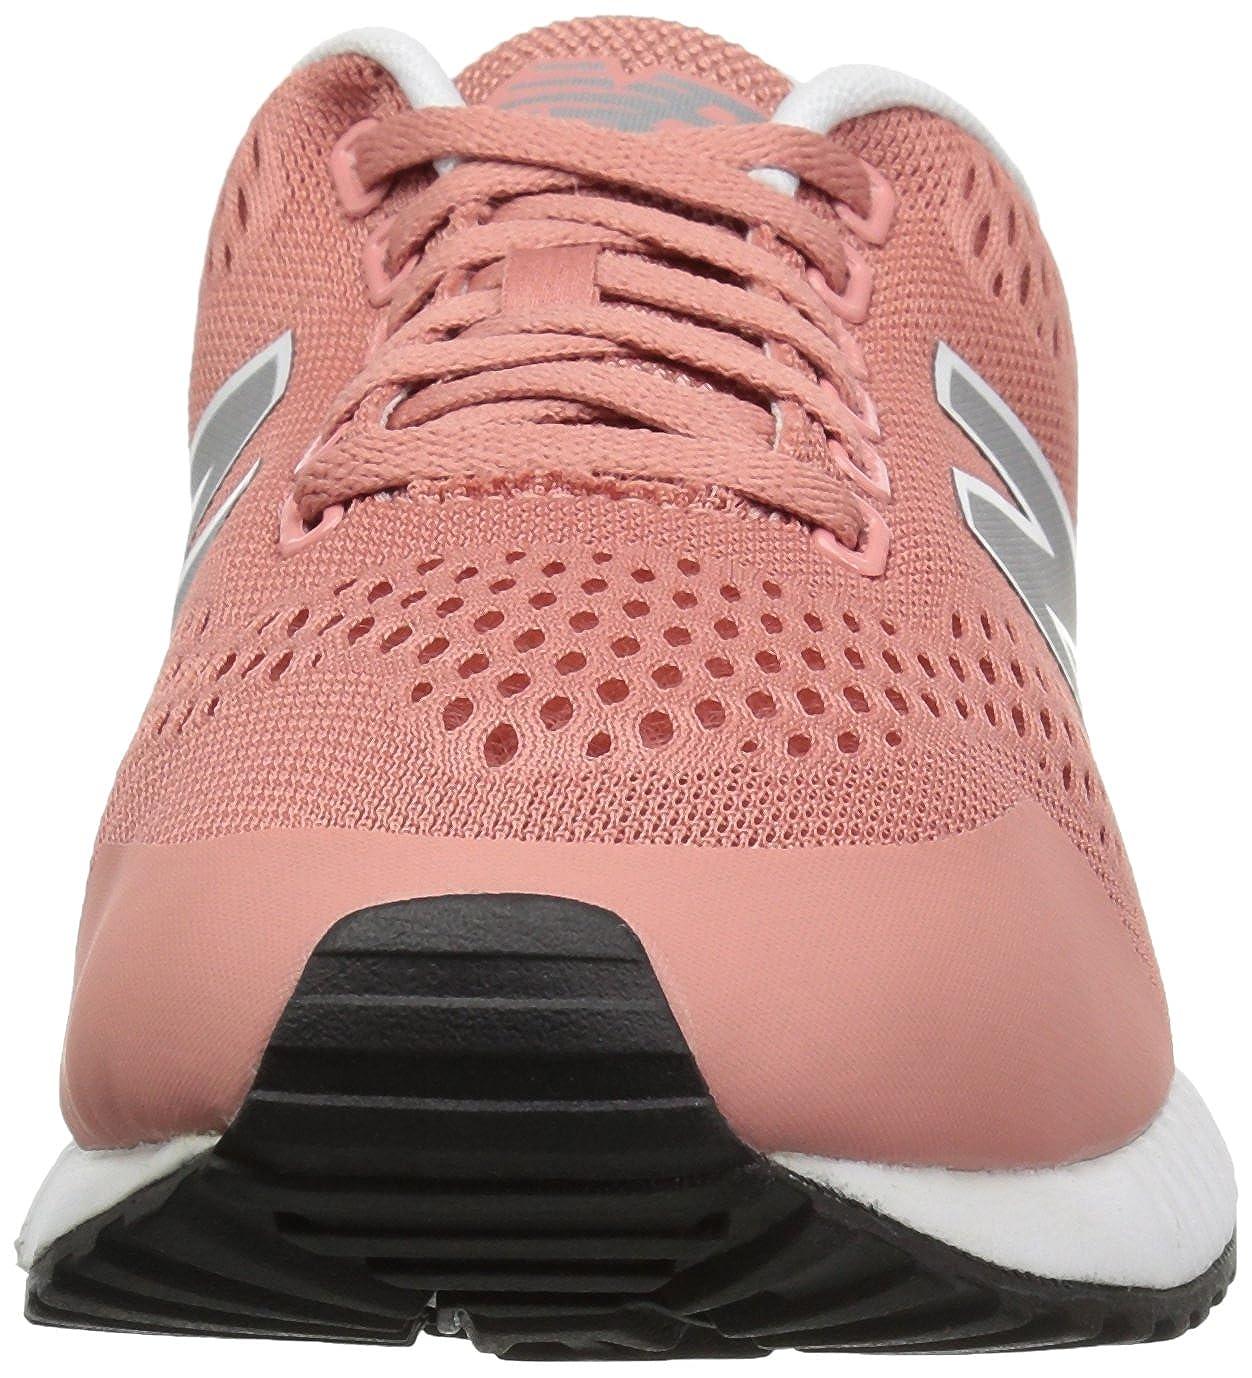 New New New Balance Damen Moderne Klassiker WL005V1 Lifestyle Schuhe bdf450